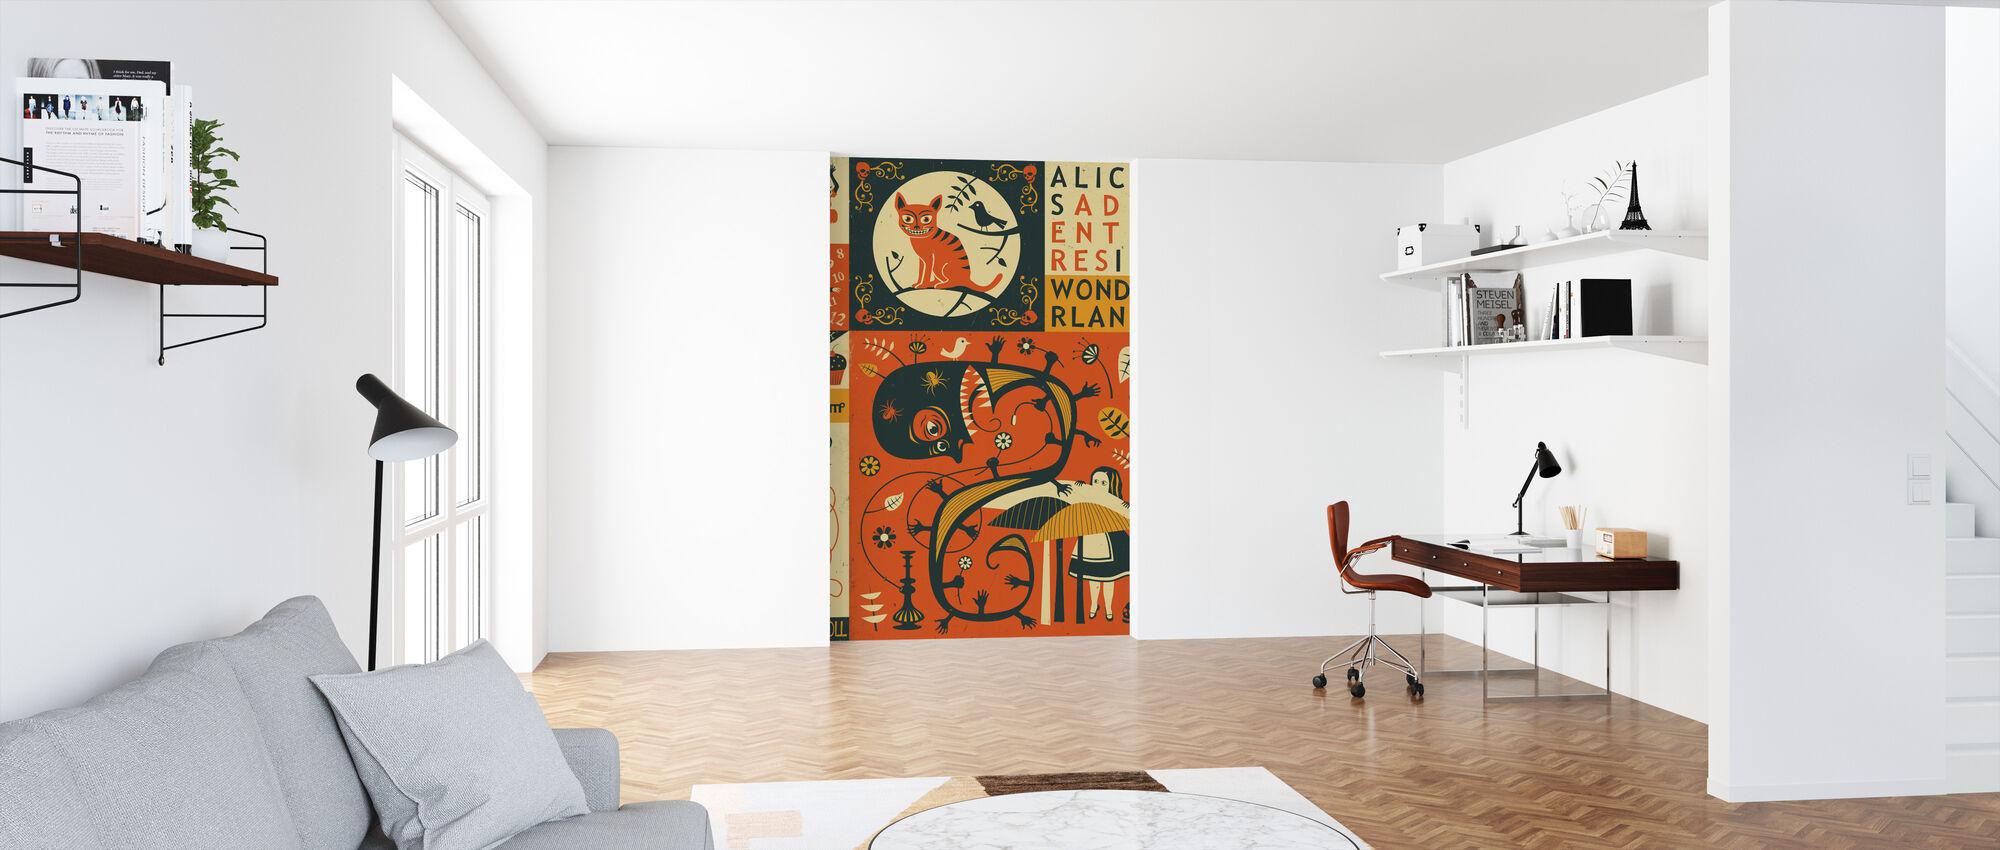 Alice in Wonderland - Wallpaper - Office